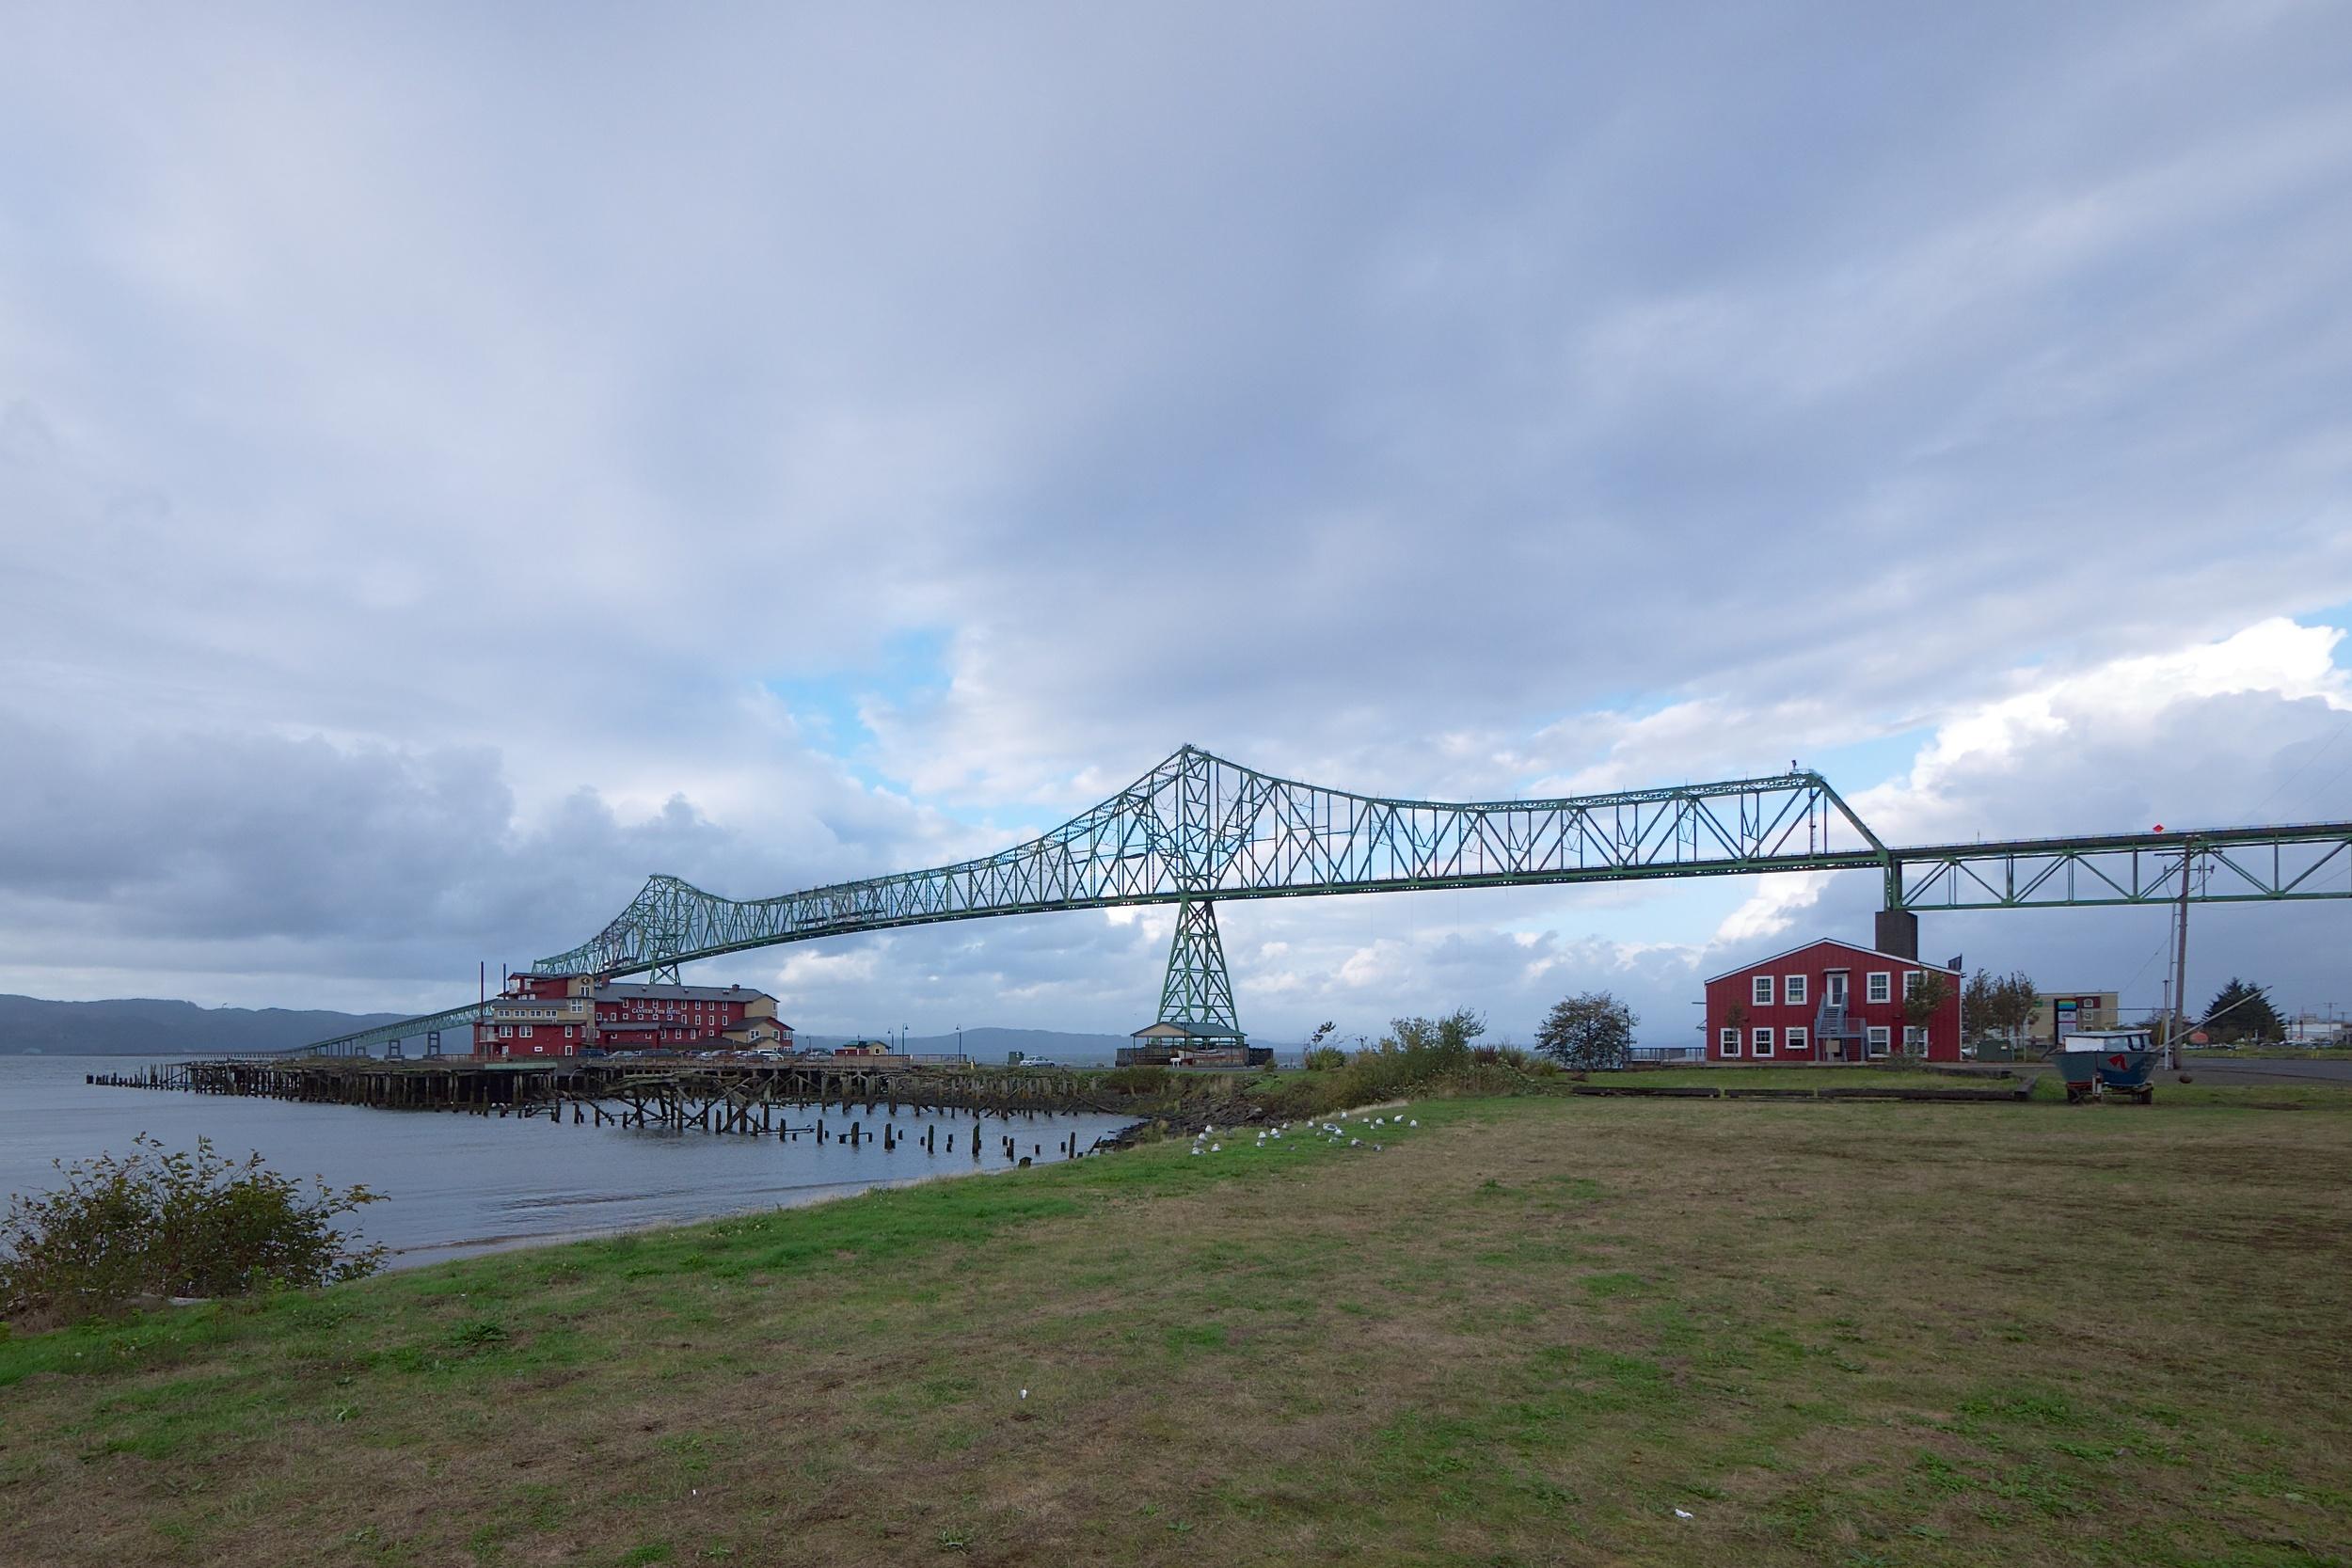 Oregon side of the Astoria-Megler bridge